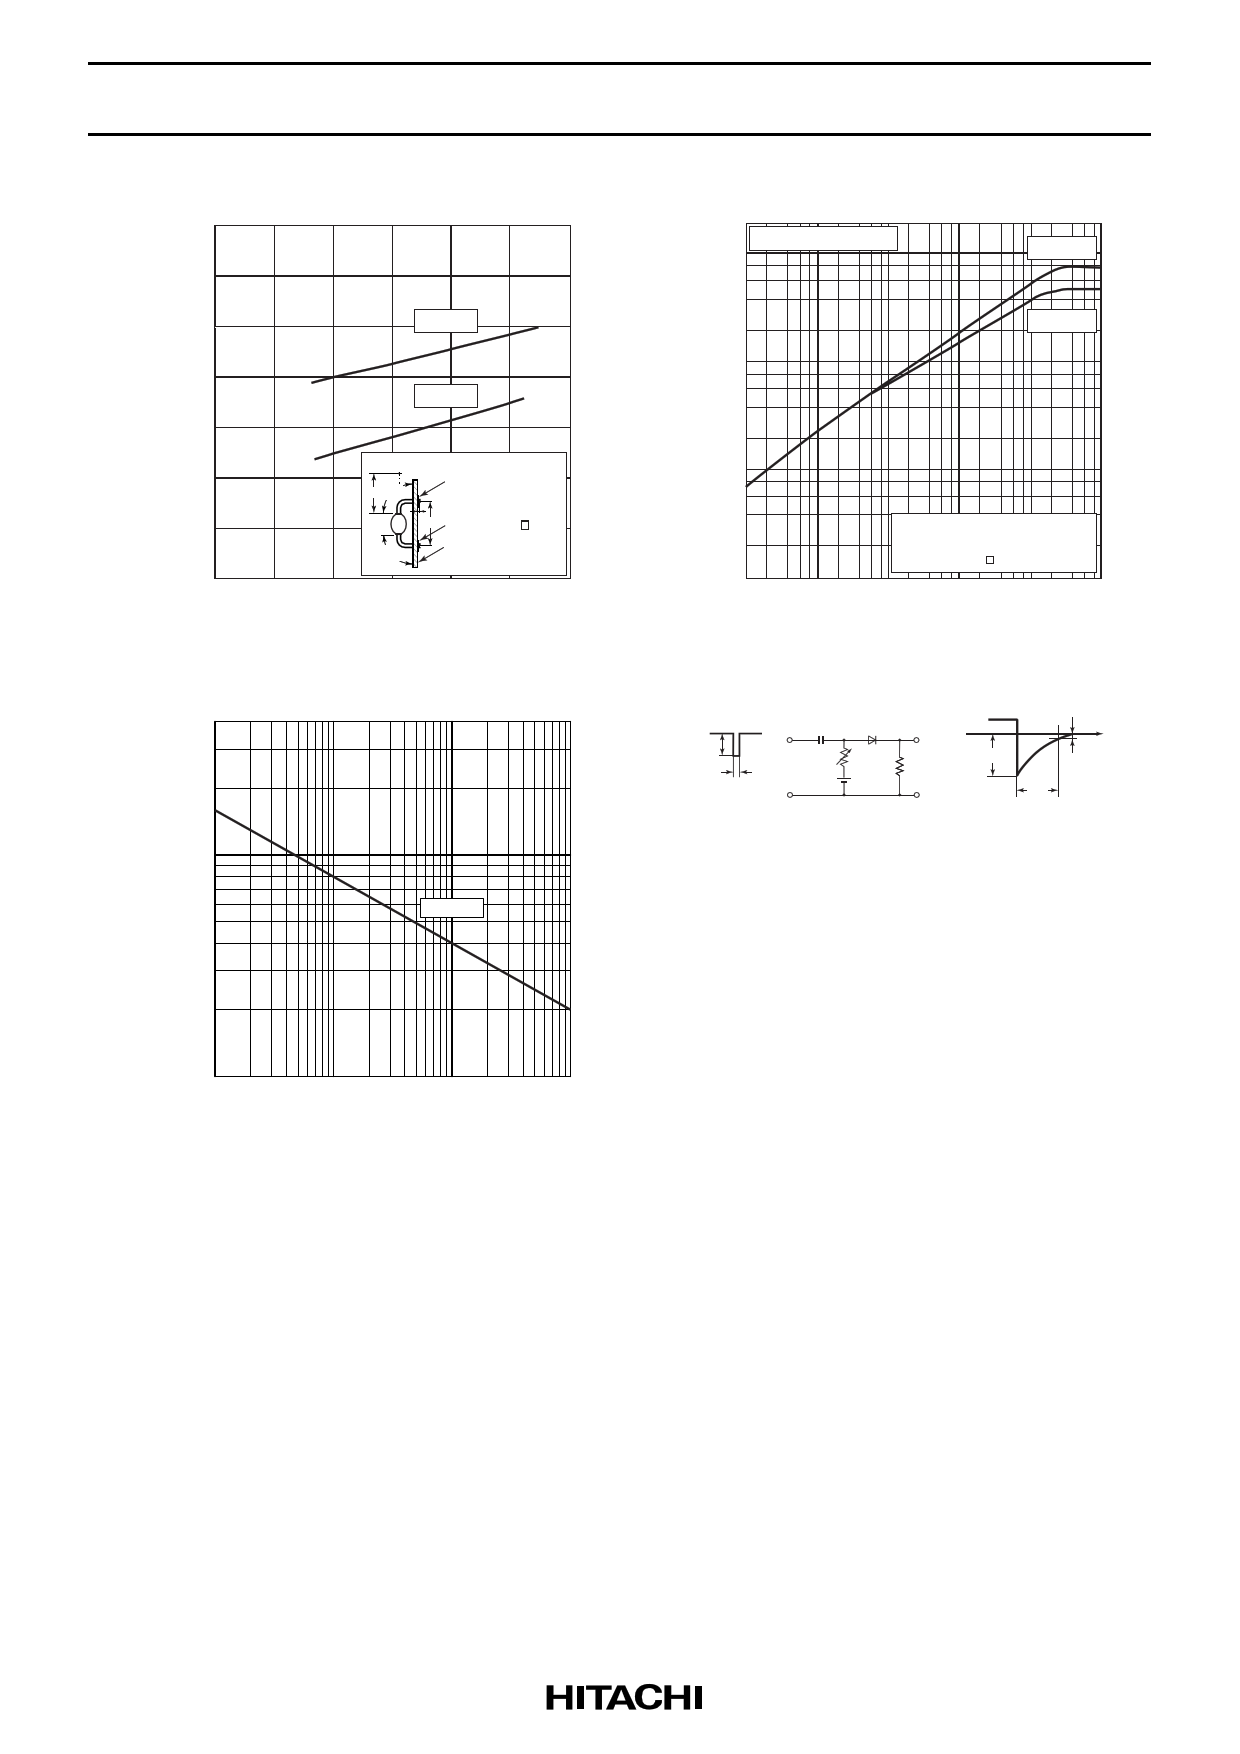 V07 pdf, 電子部品, 半導体, ピン配列